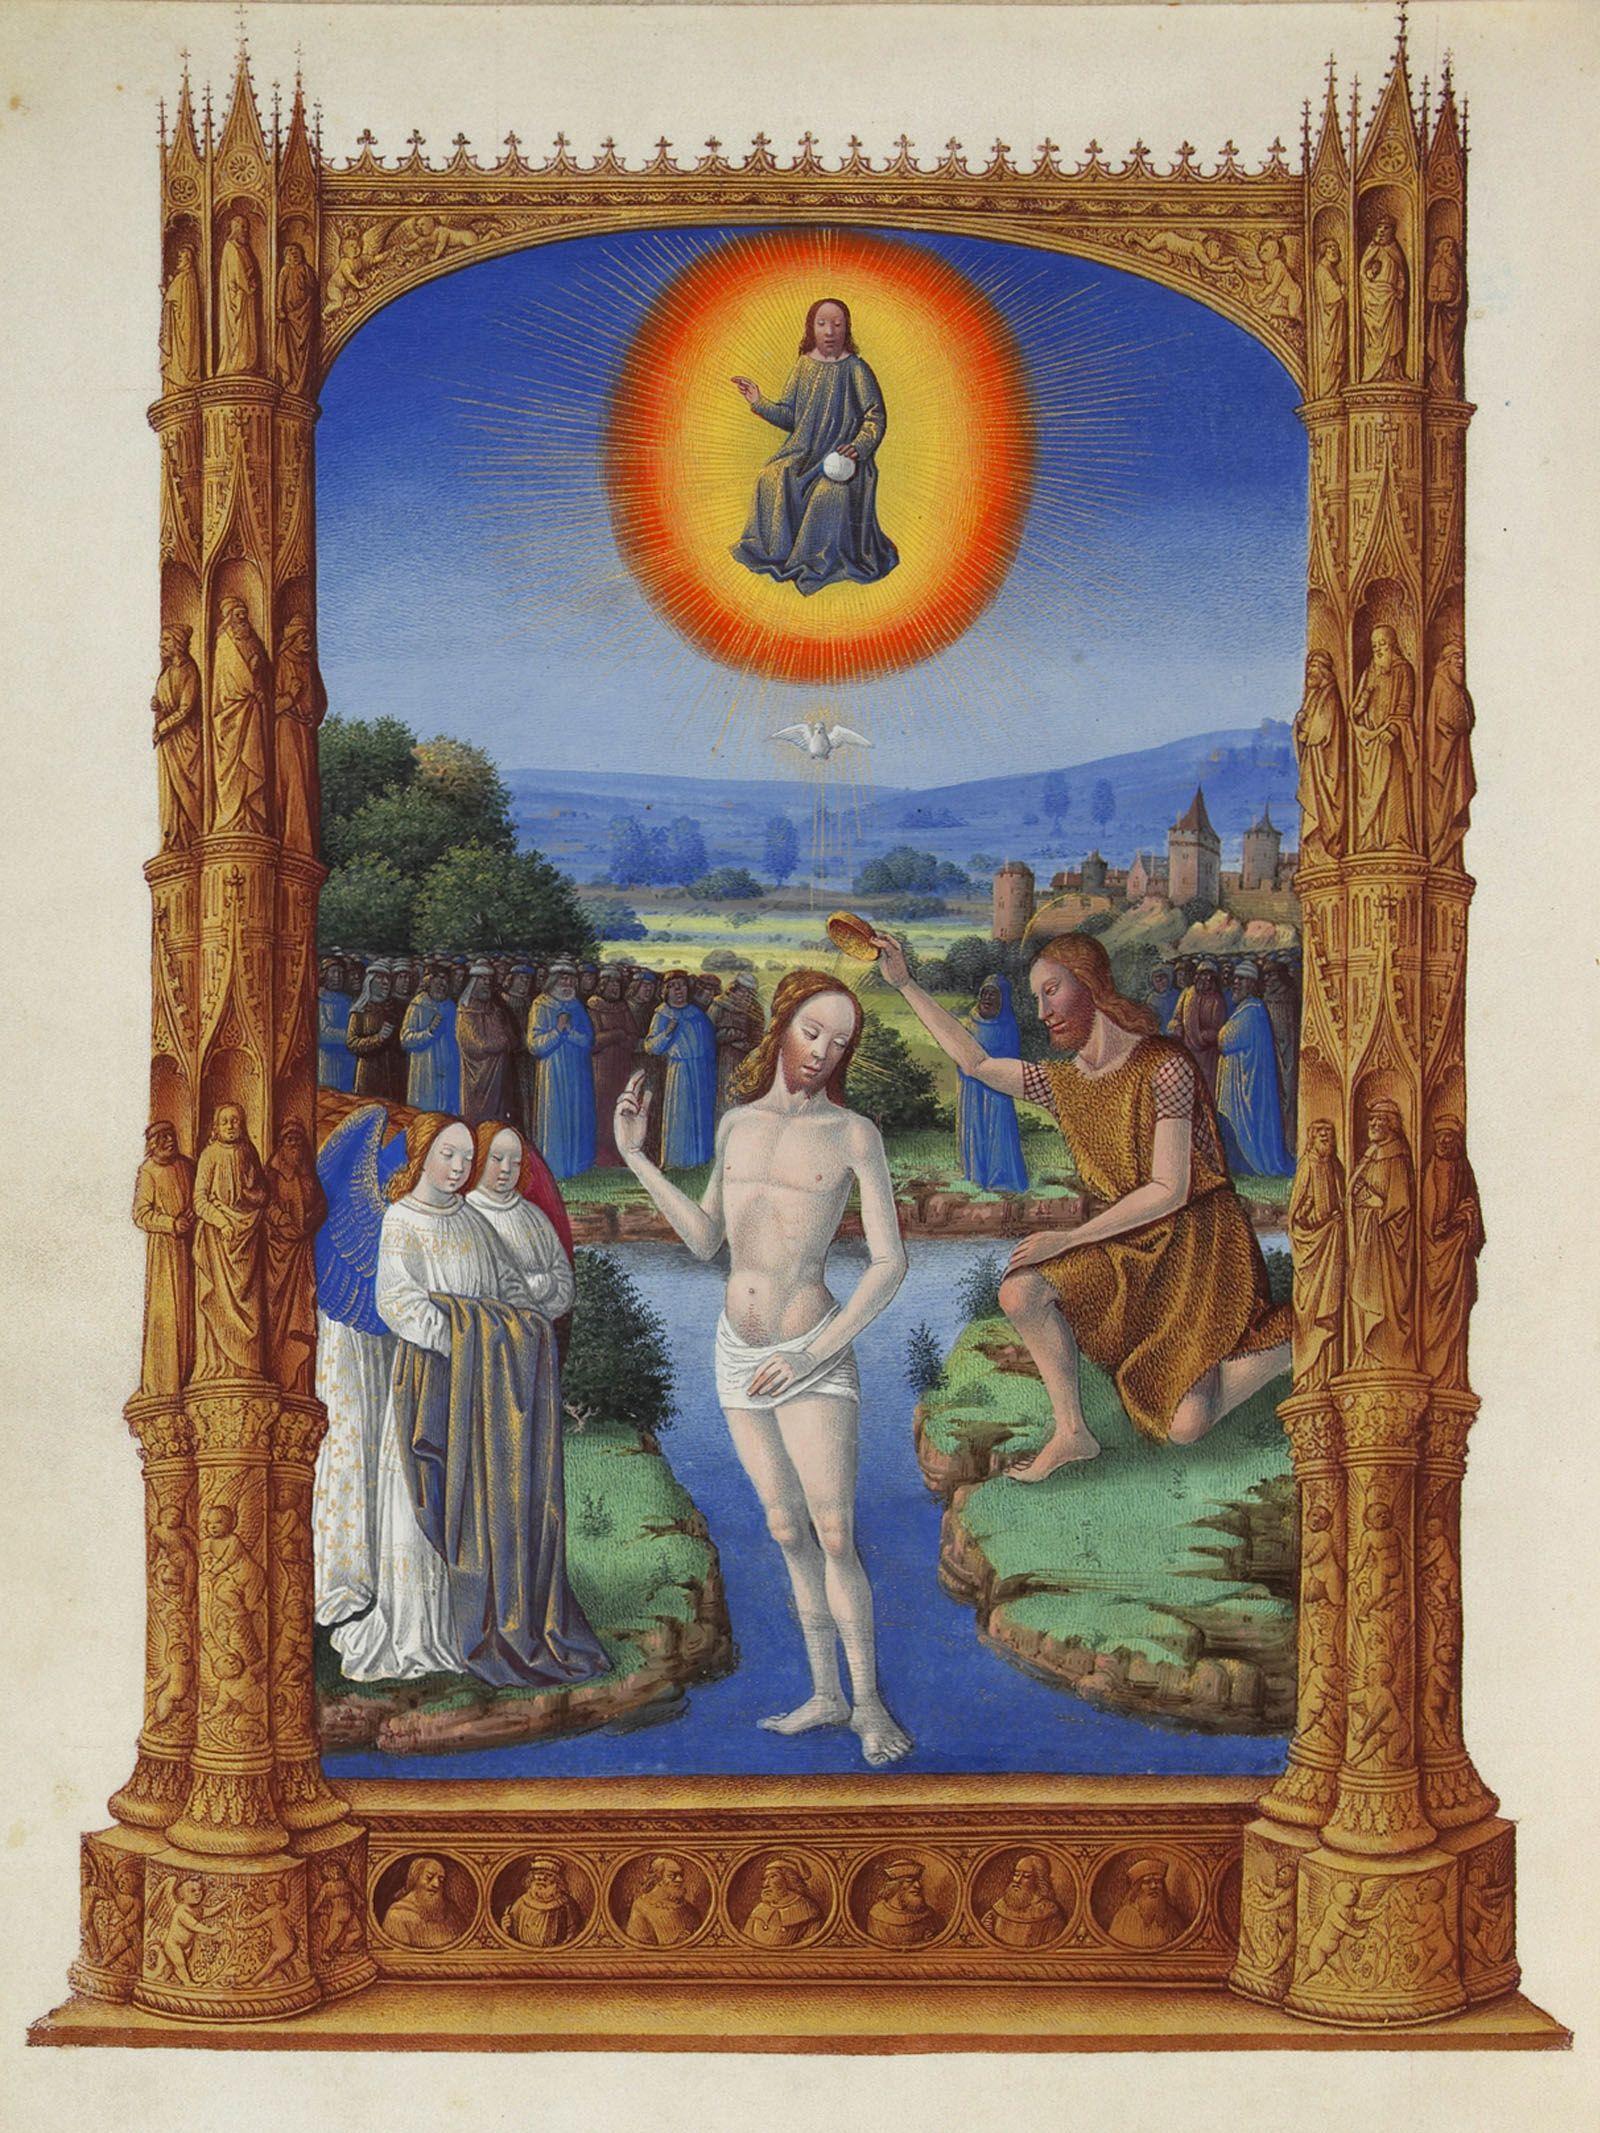 Son of God - Wikipedia